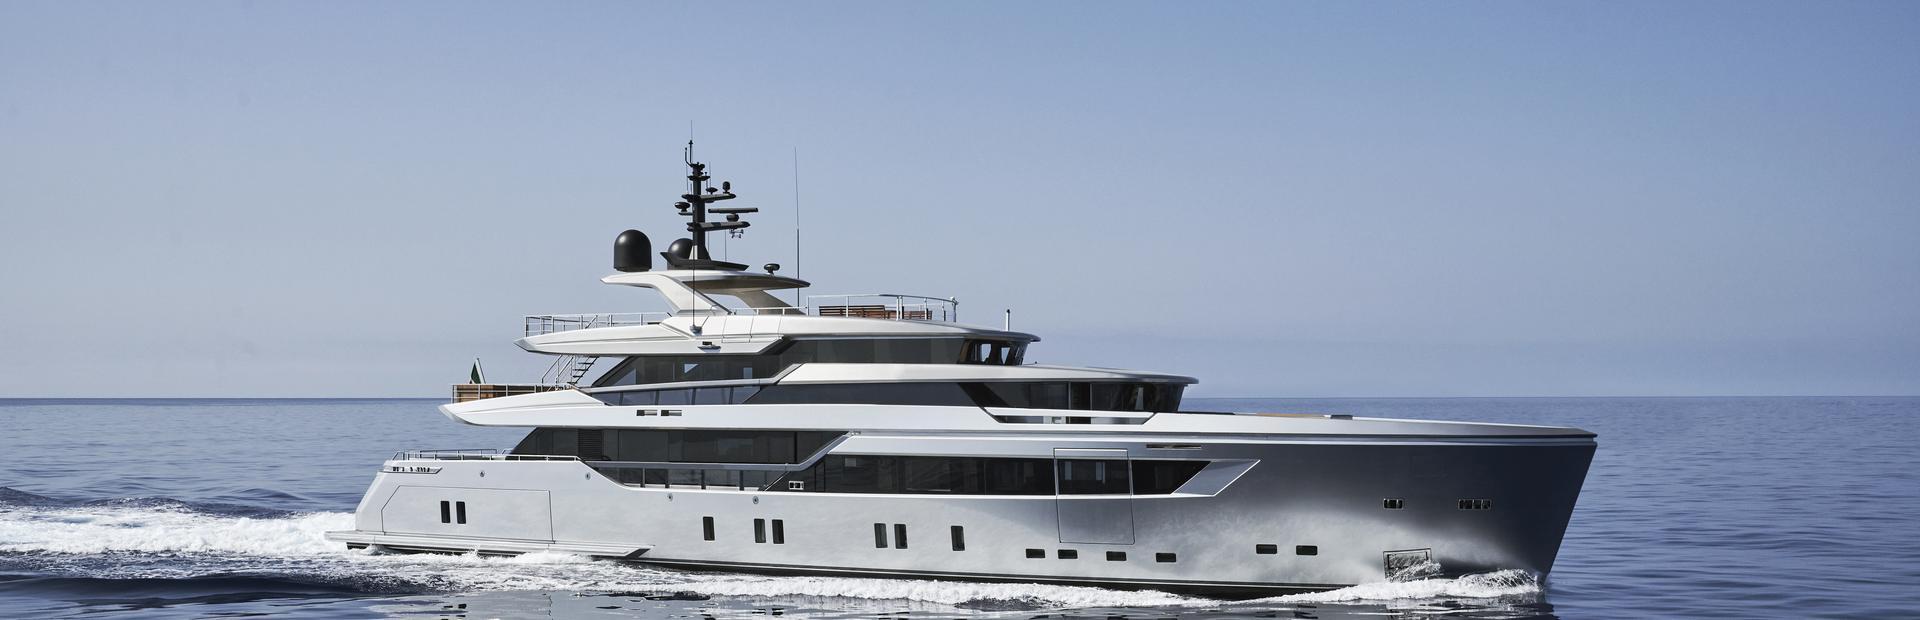 Alloy Yacht Charter